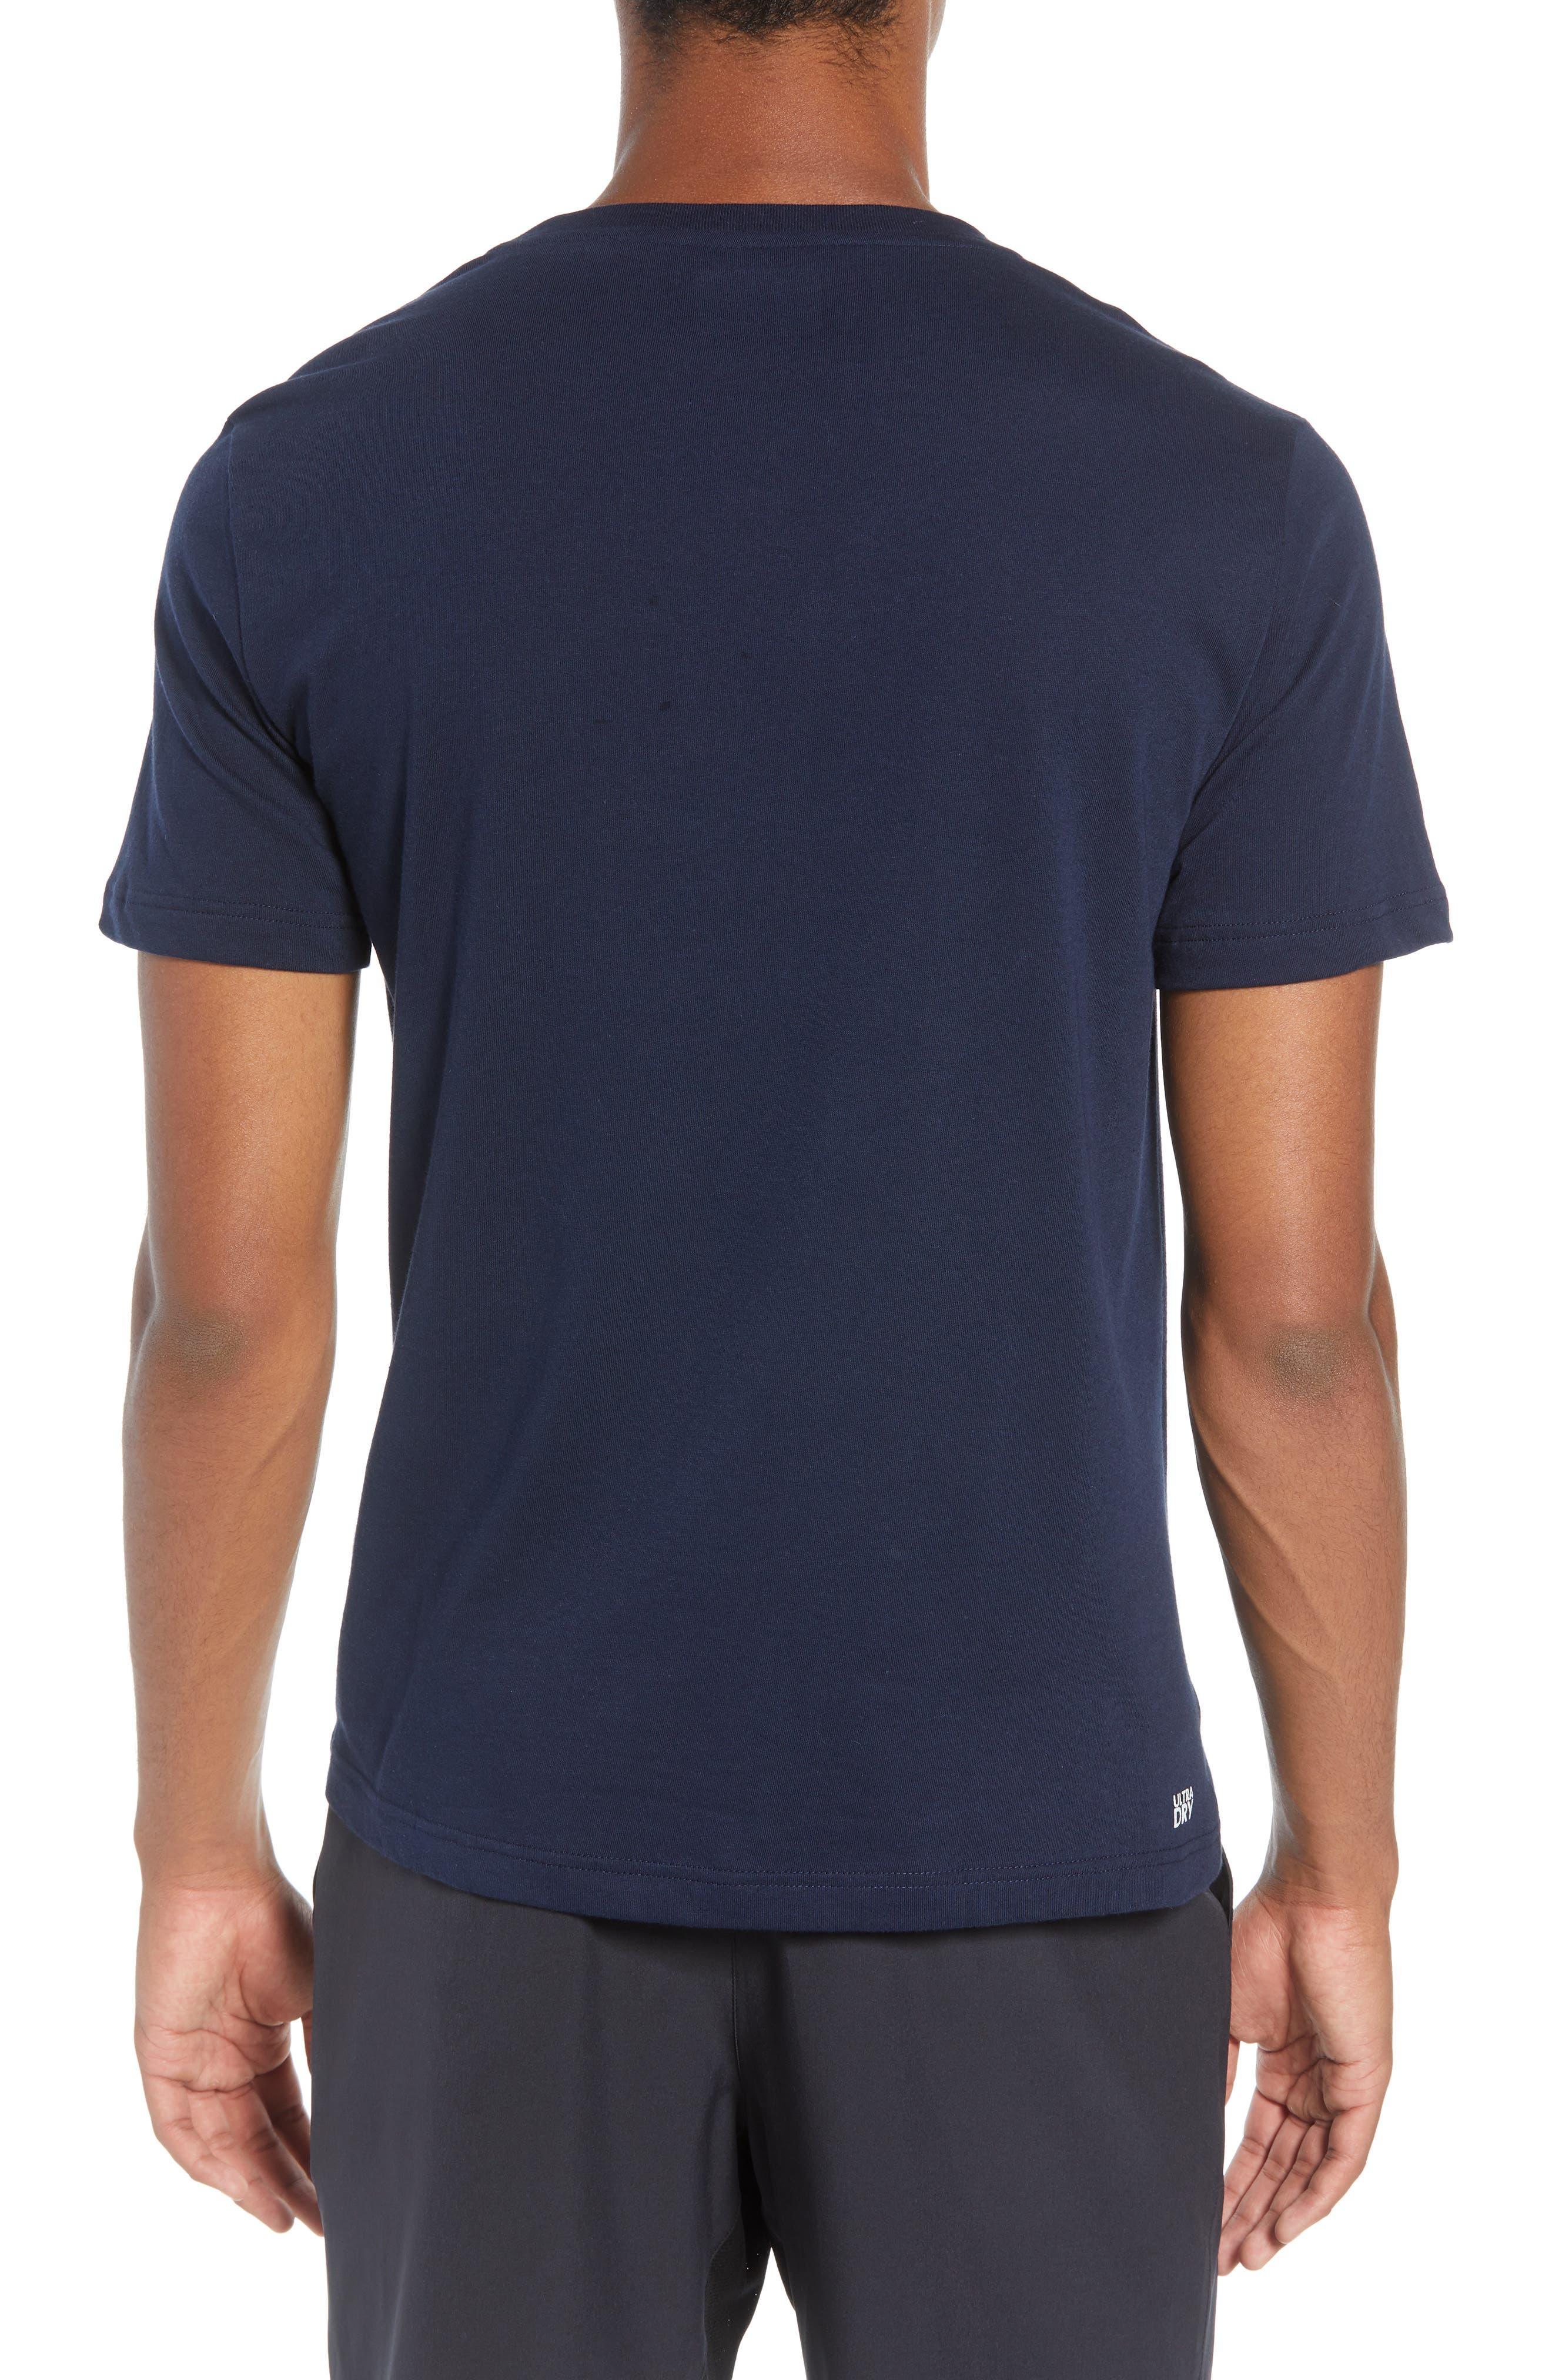 Tech Jersey Regular Fit Tee,                             Alternate thumbnail 2, color,                             NAVY BLUE/ WHITE